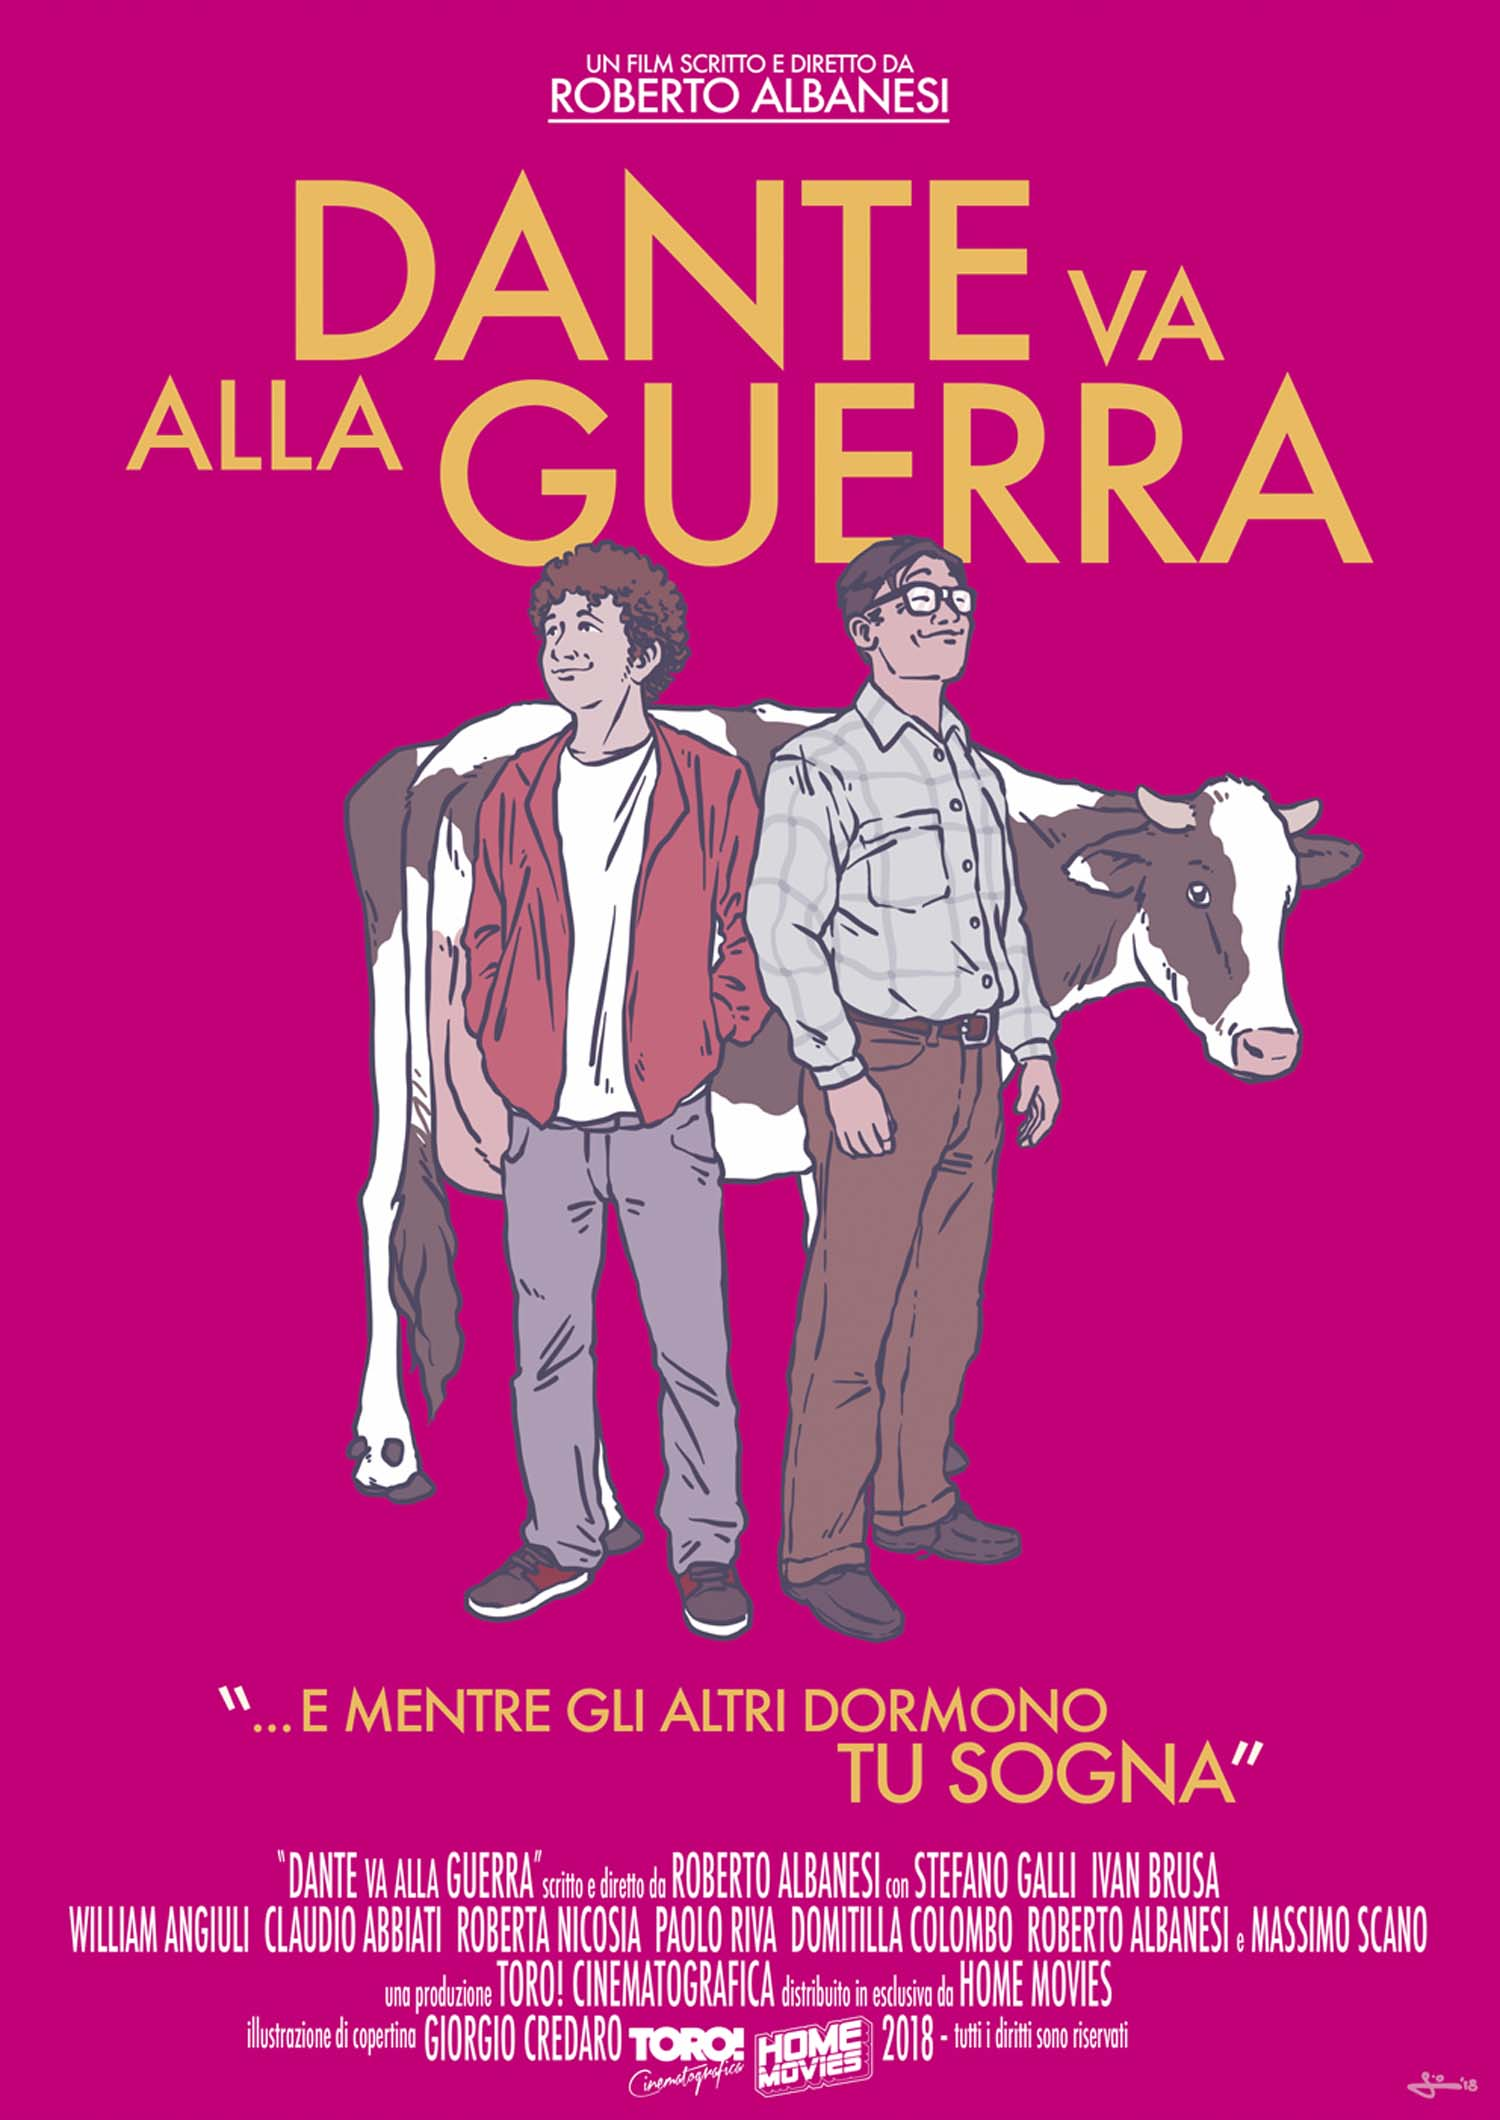 DANTE VA ALLA GUERRA (DVD)